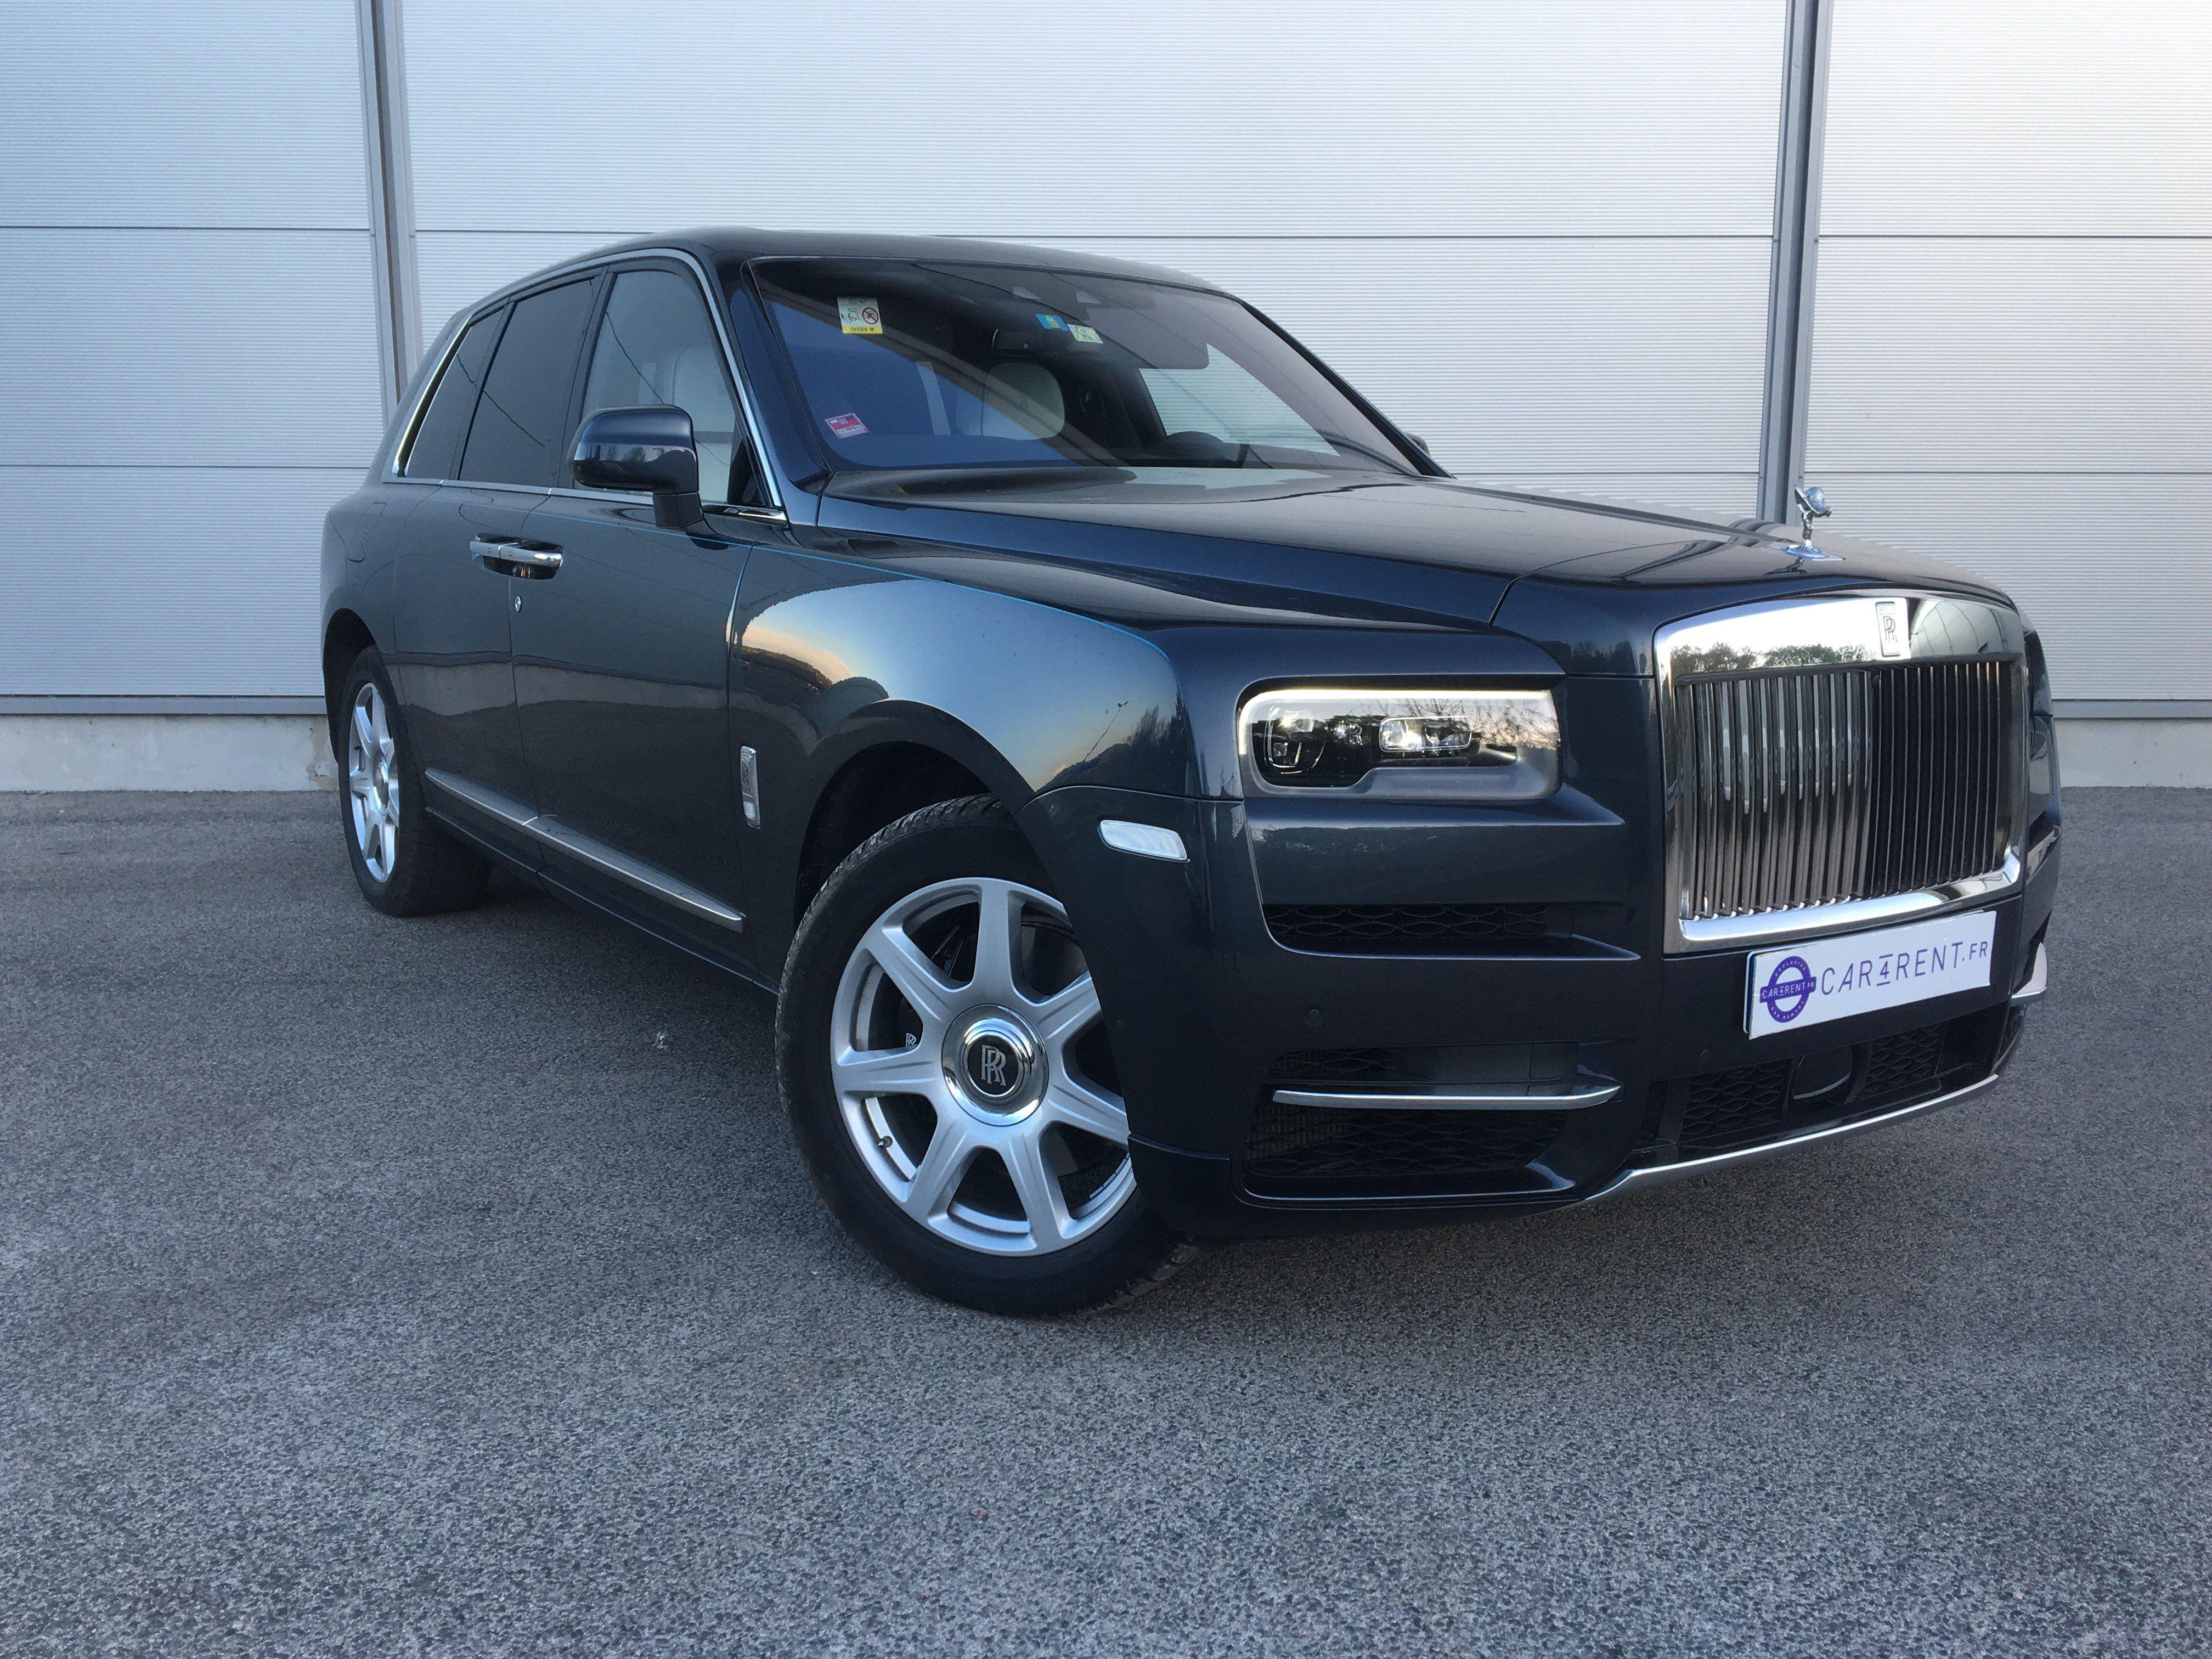 Rolls royce Cullinan hire Monaco